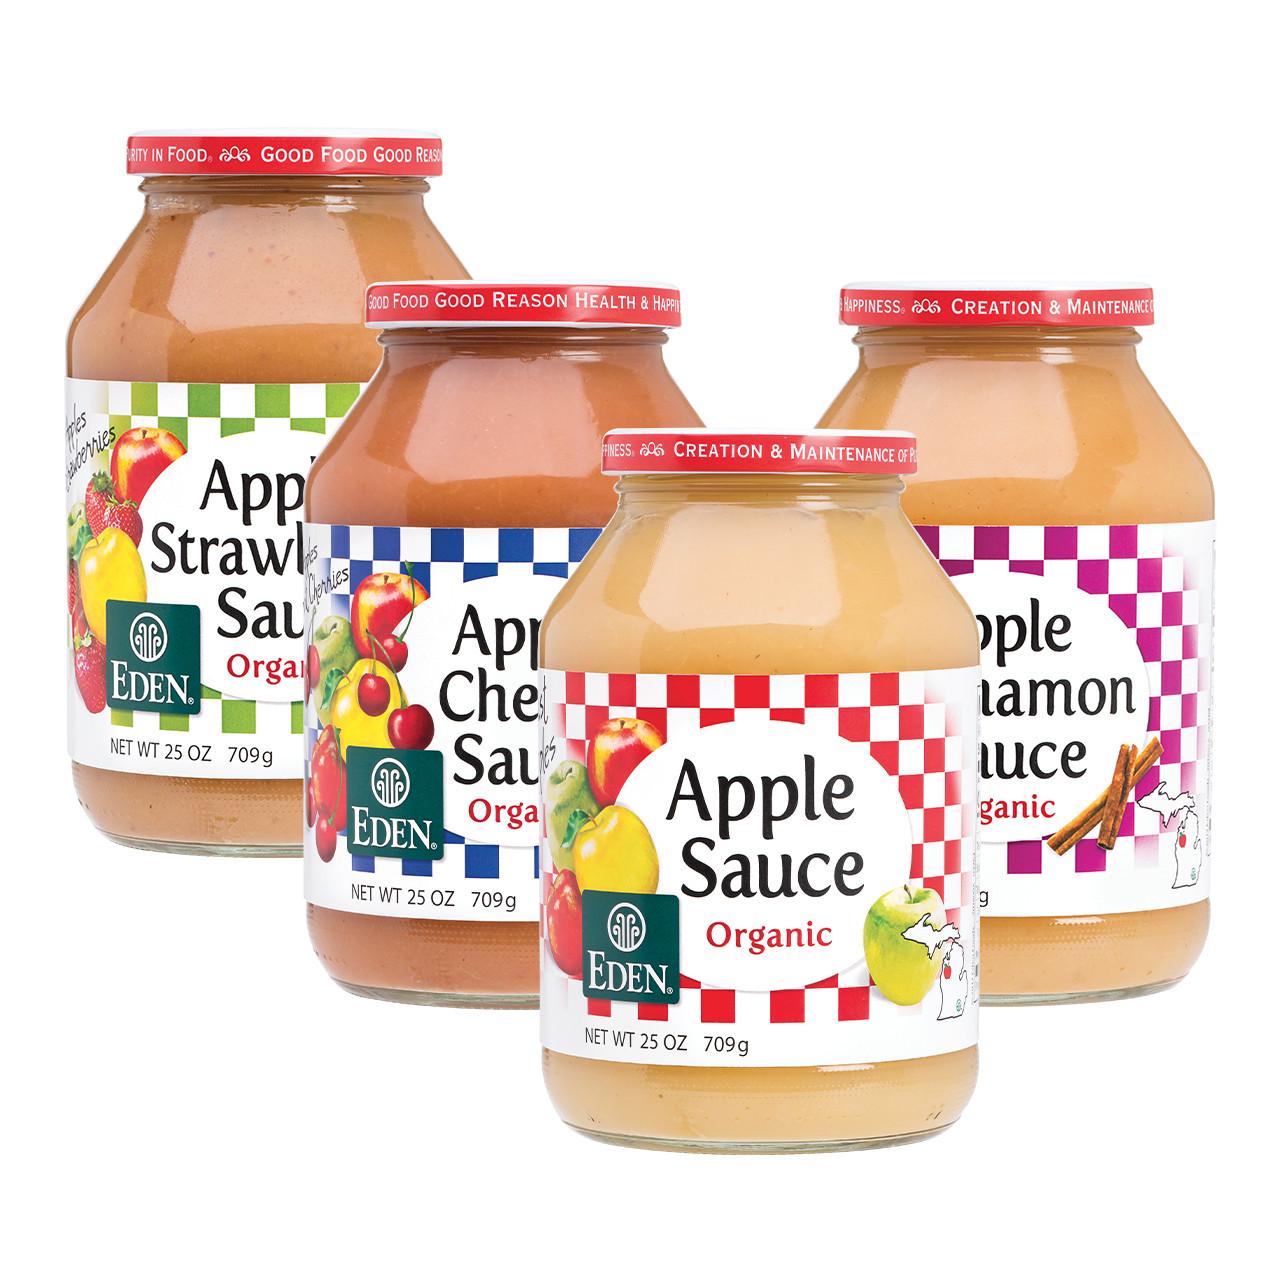 Apple Sauce Sampler, Organic